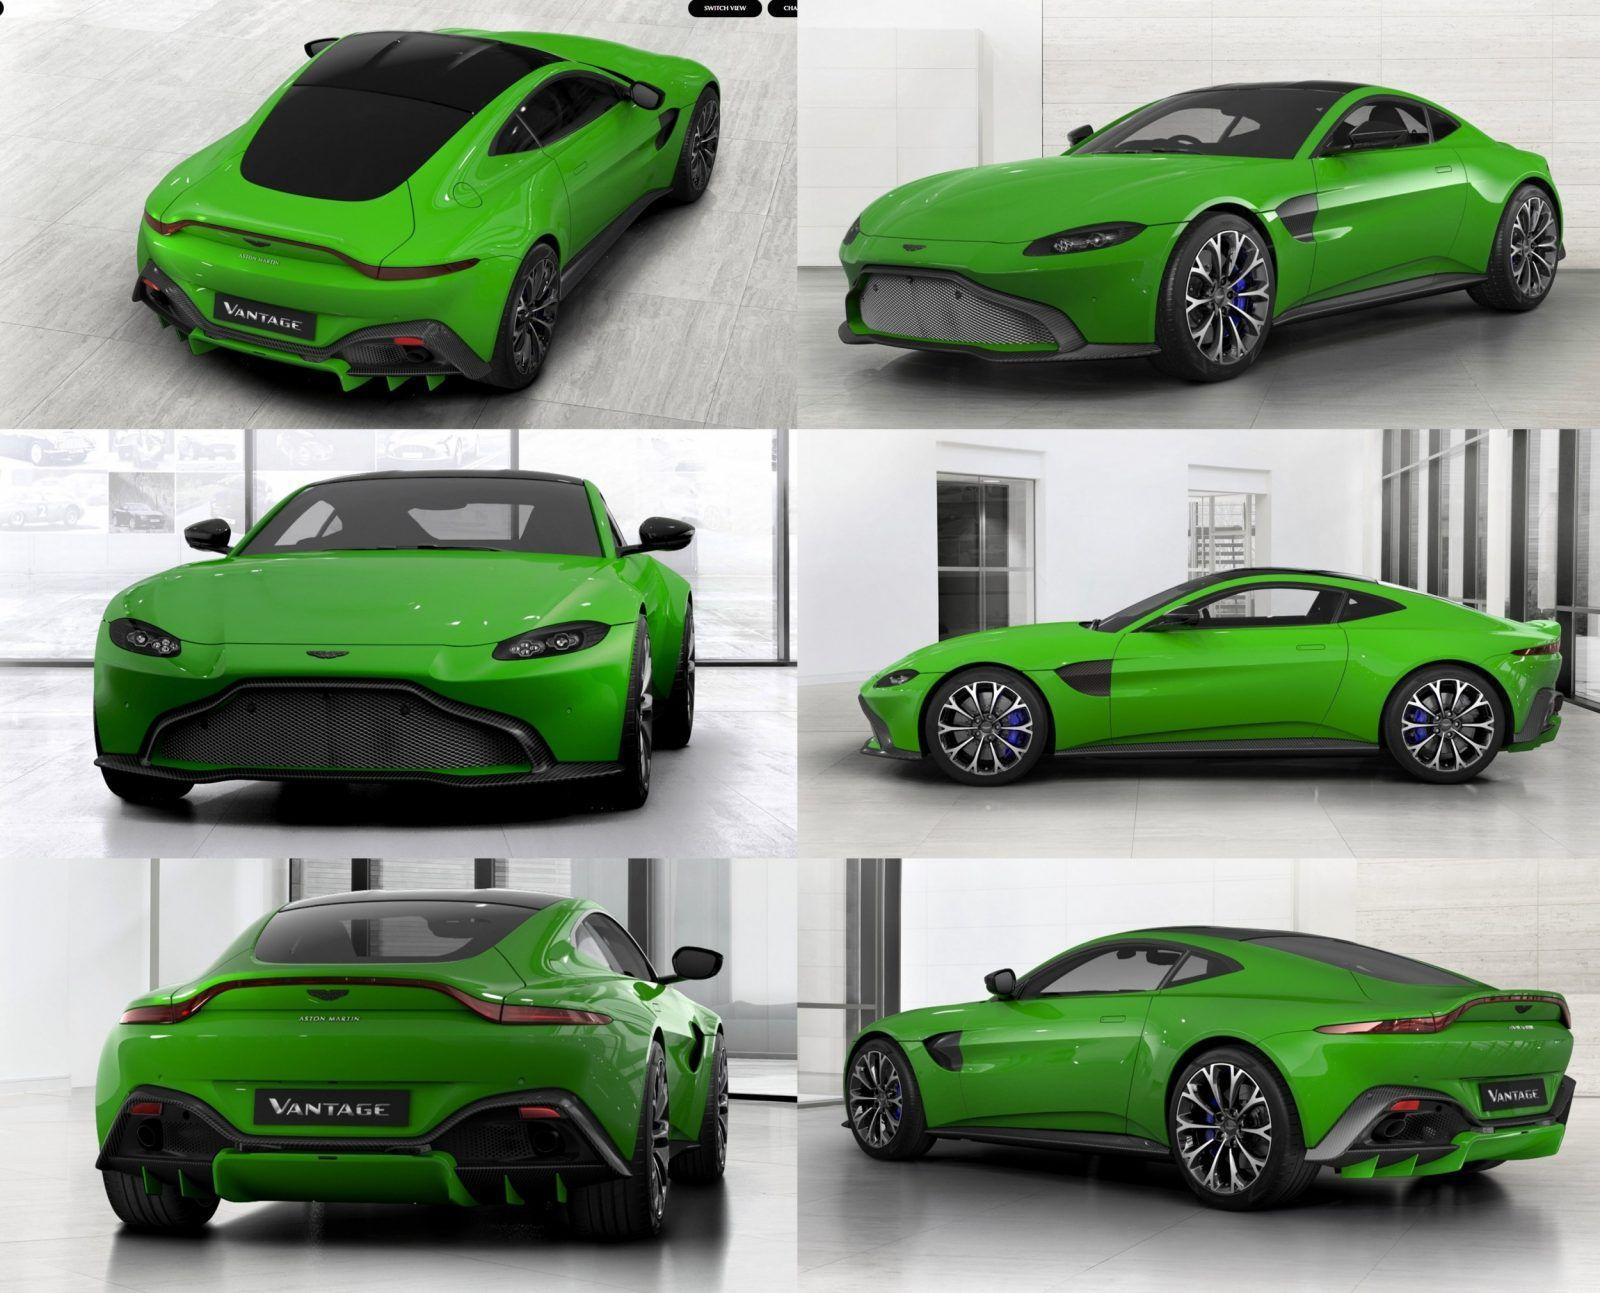 2018 Aston Martin Vantage Official Configurator Gifs Q Palette